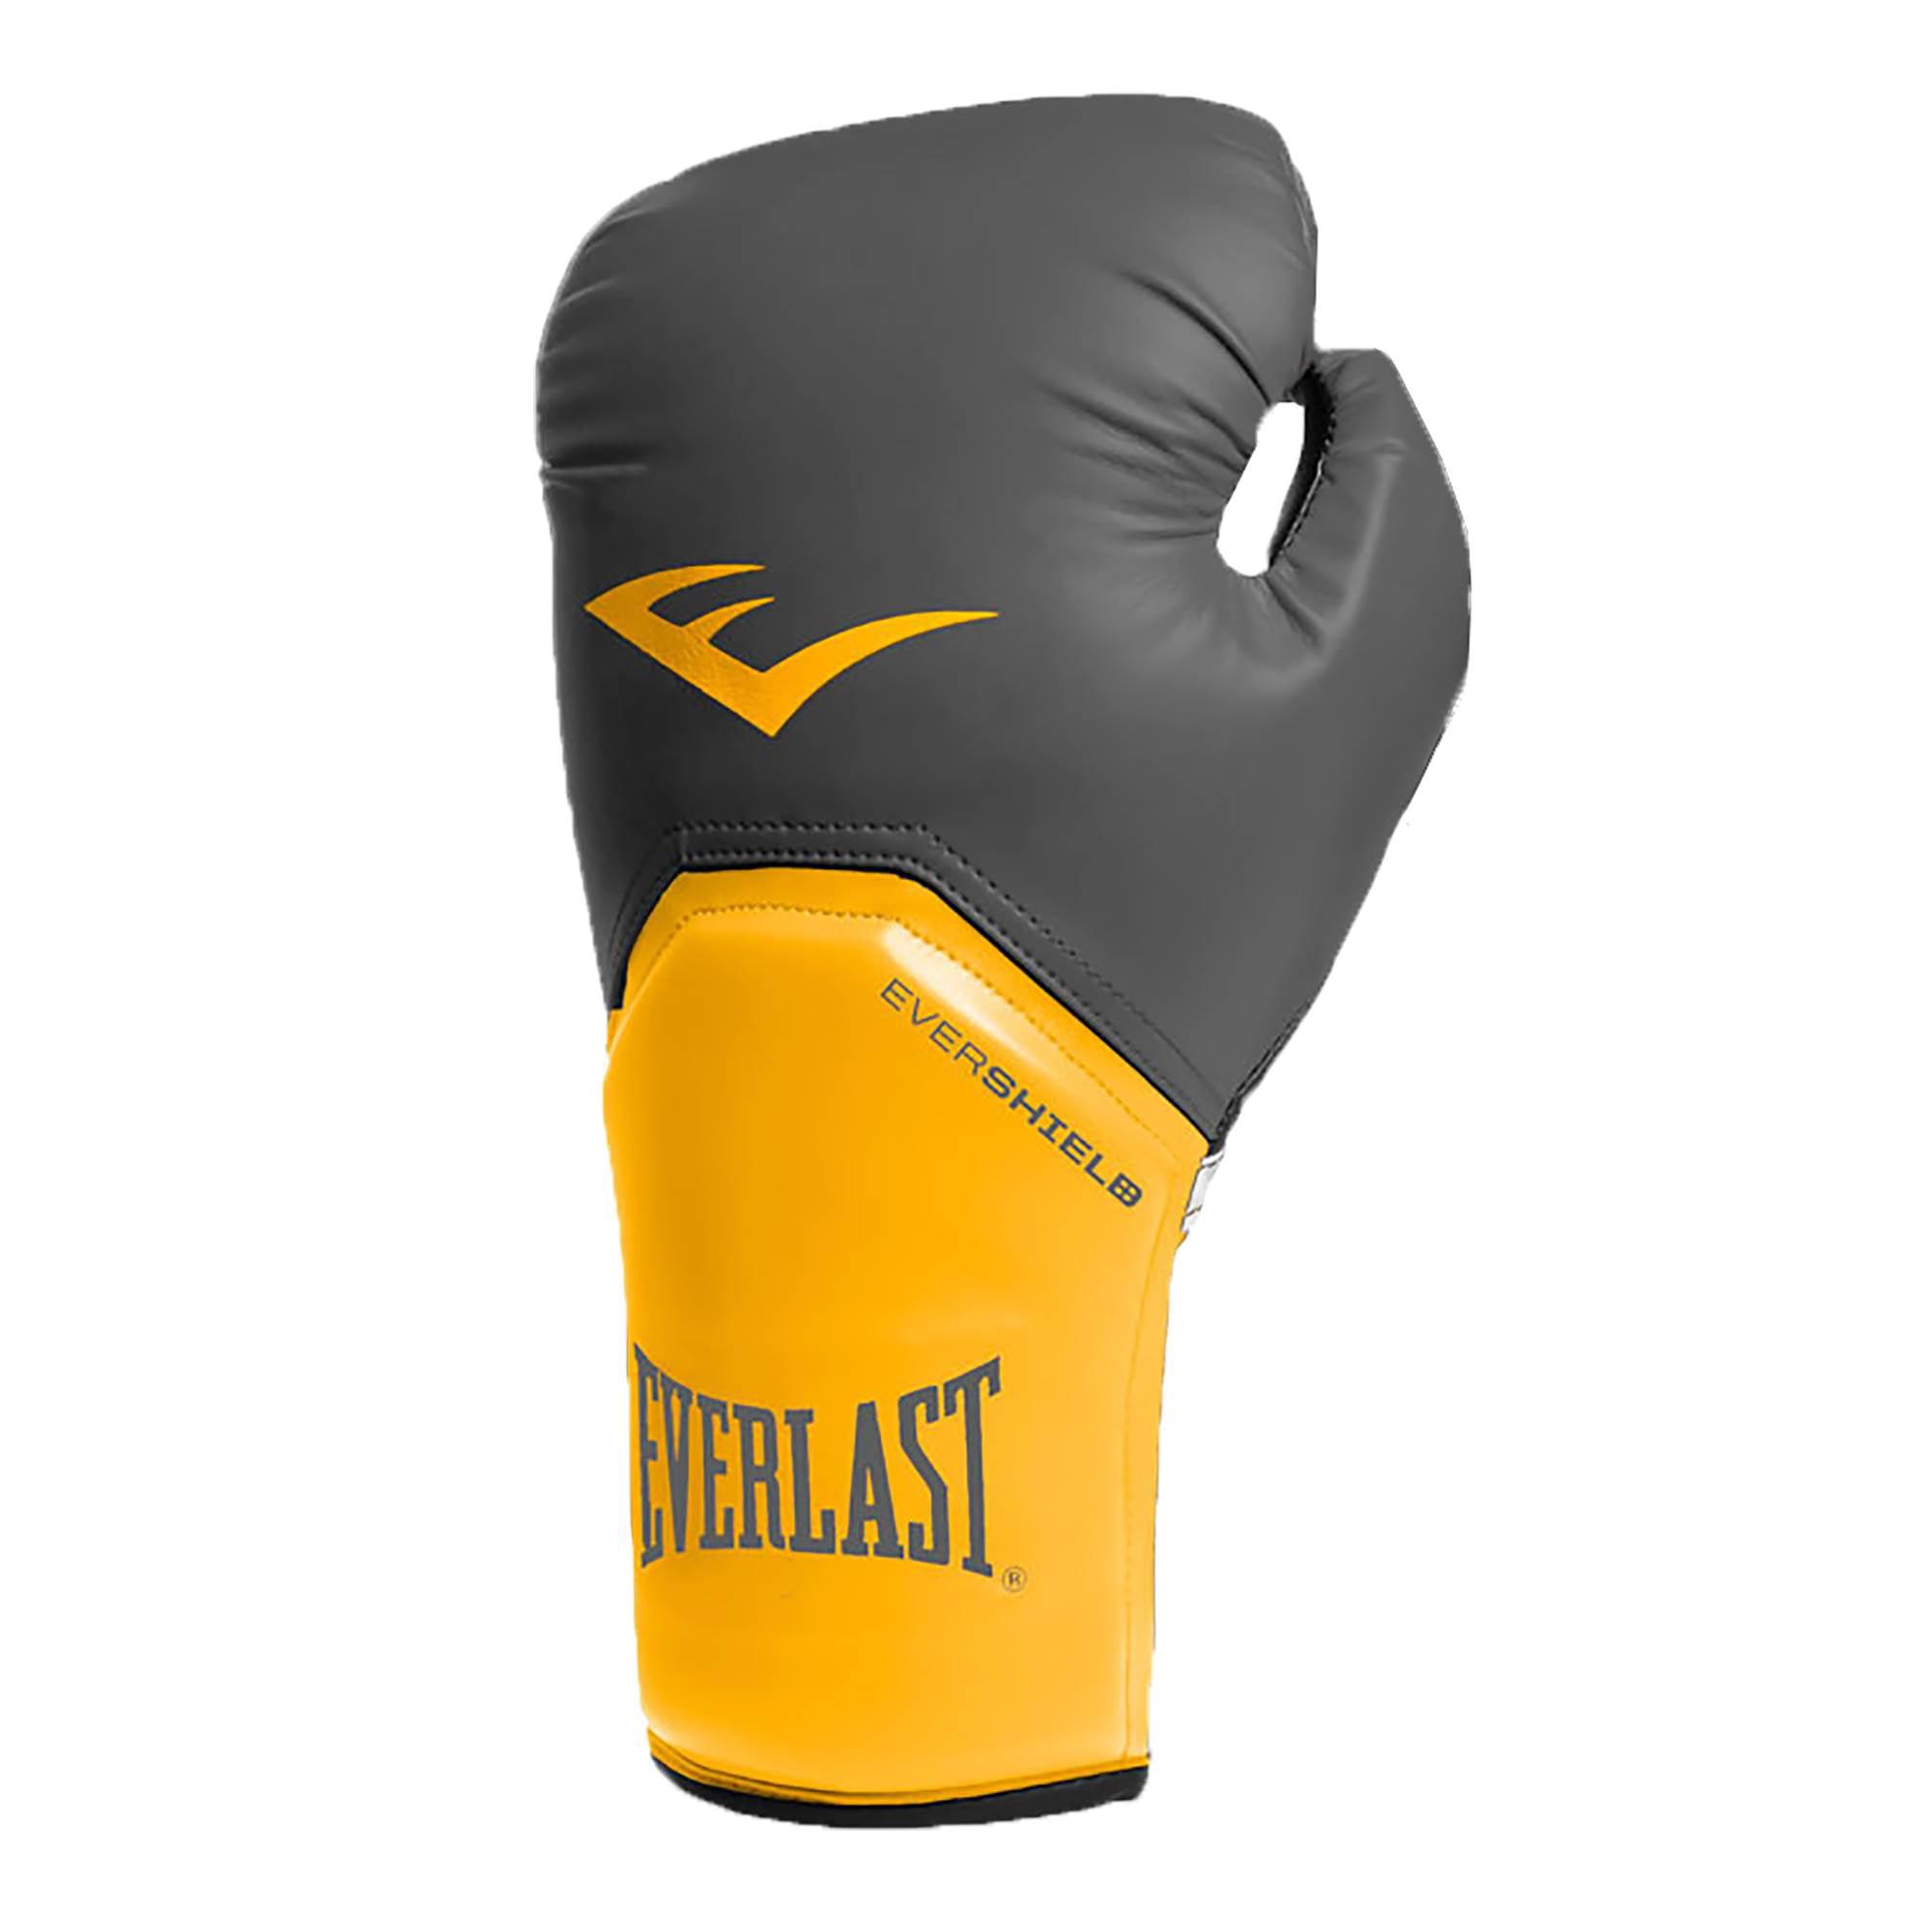 Everlast 16 Ounce Pro Style Elite Advanced Cardio Punching Bag MMA Kickboxing and Boxing Training Gloves Black